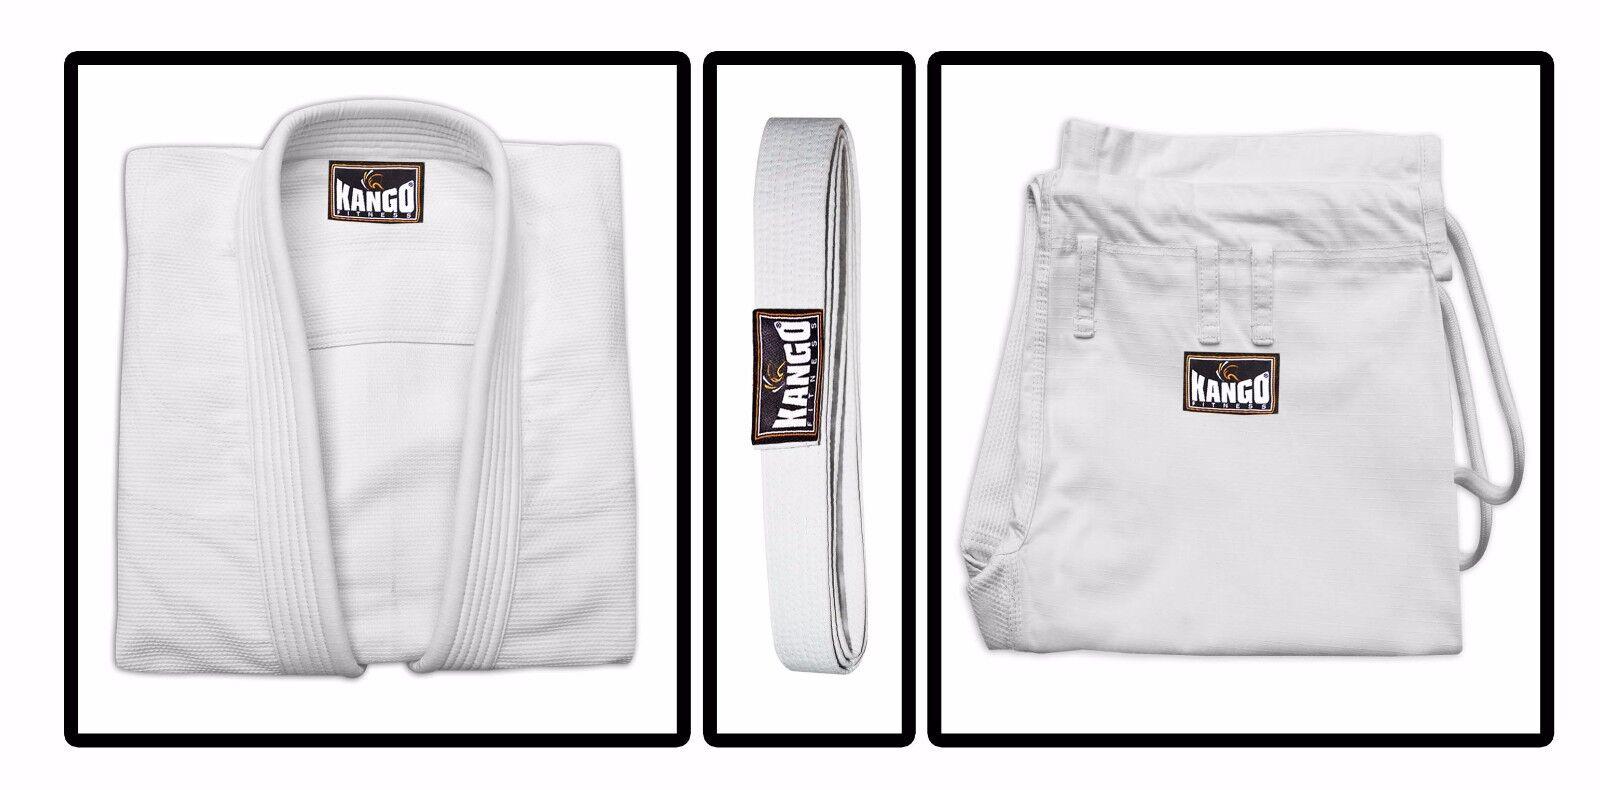 24d737f3f09aa Jiu Jitsu Uniform or Gi Premium Blank with Free Belt Brazilian ...